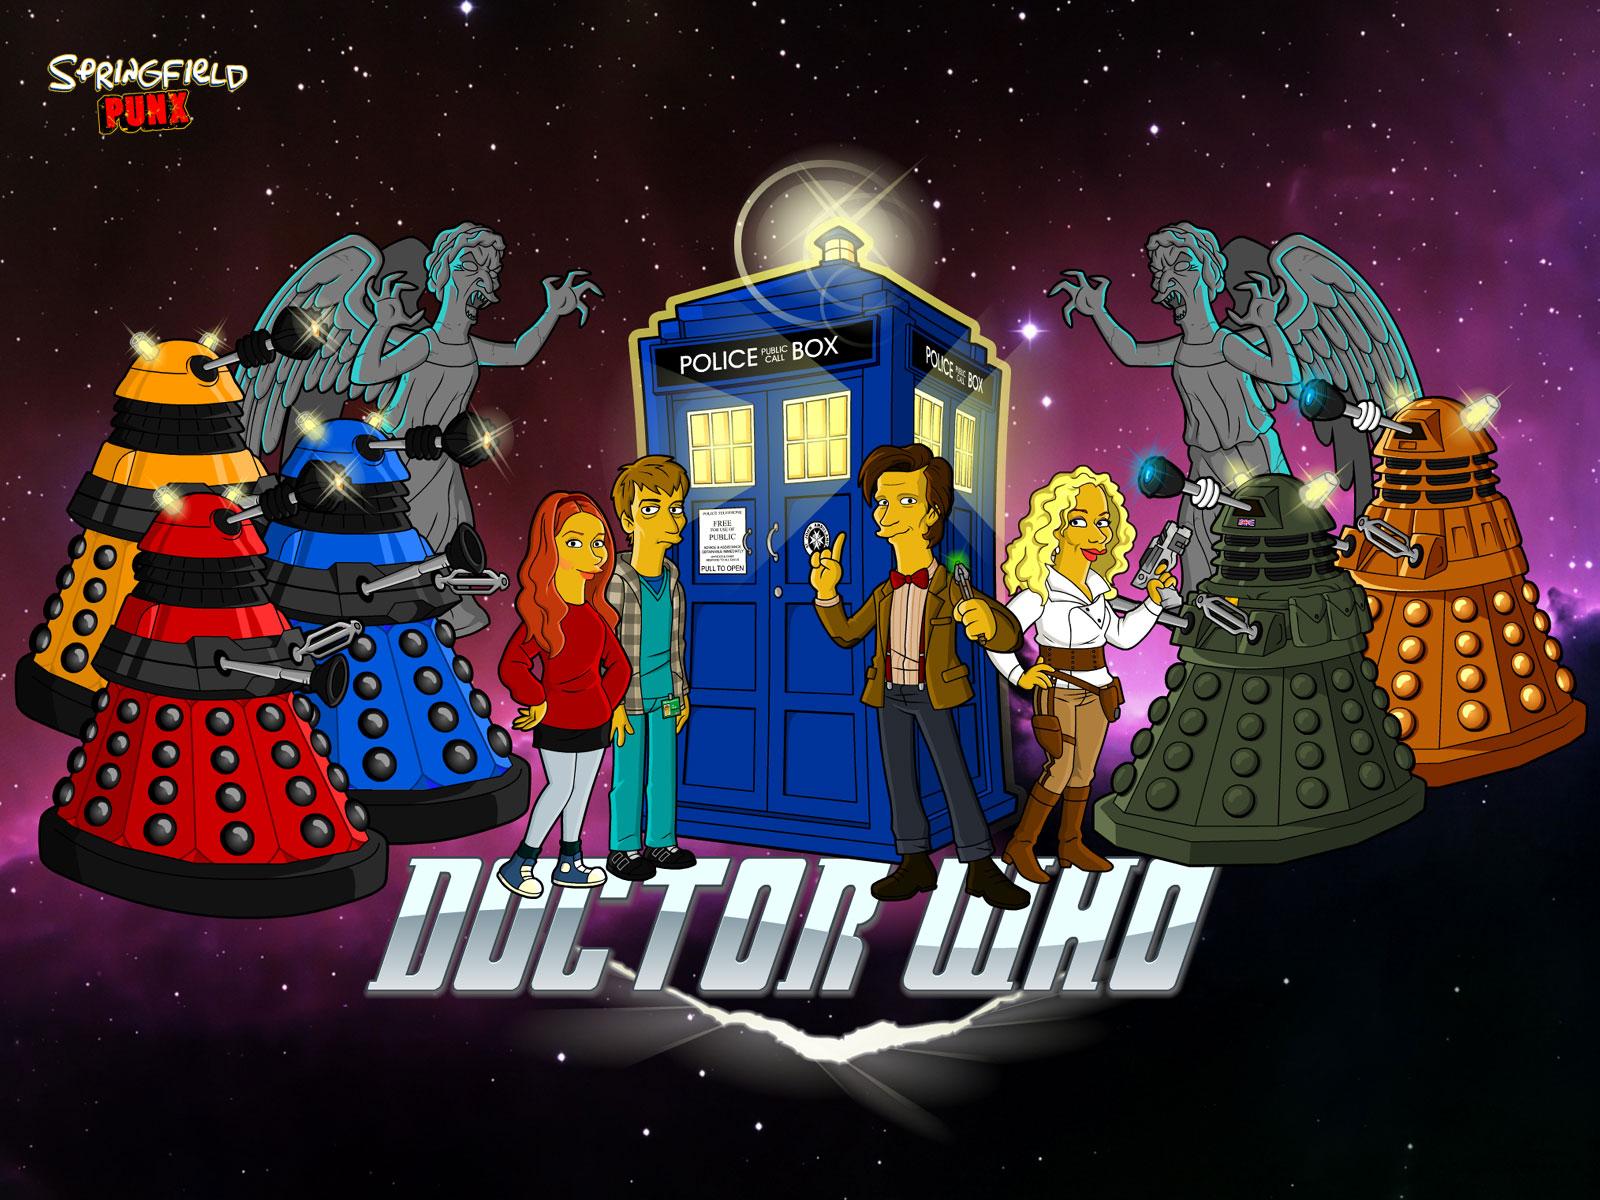 Doctor Who HD | Wallpup.com